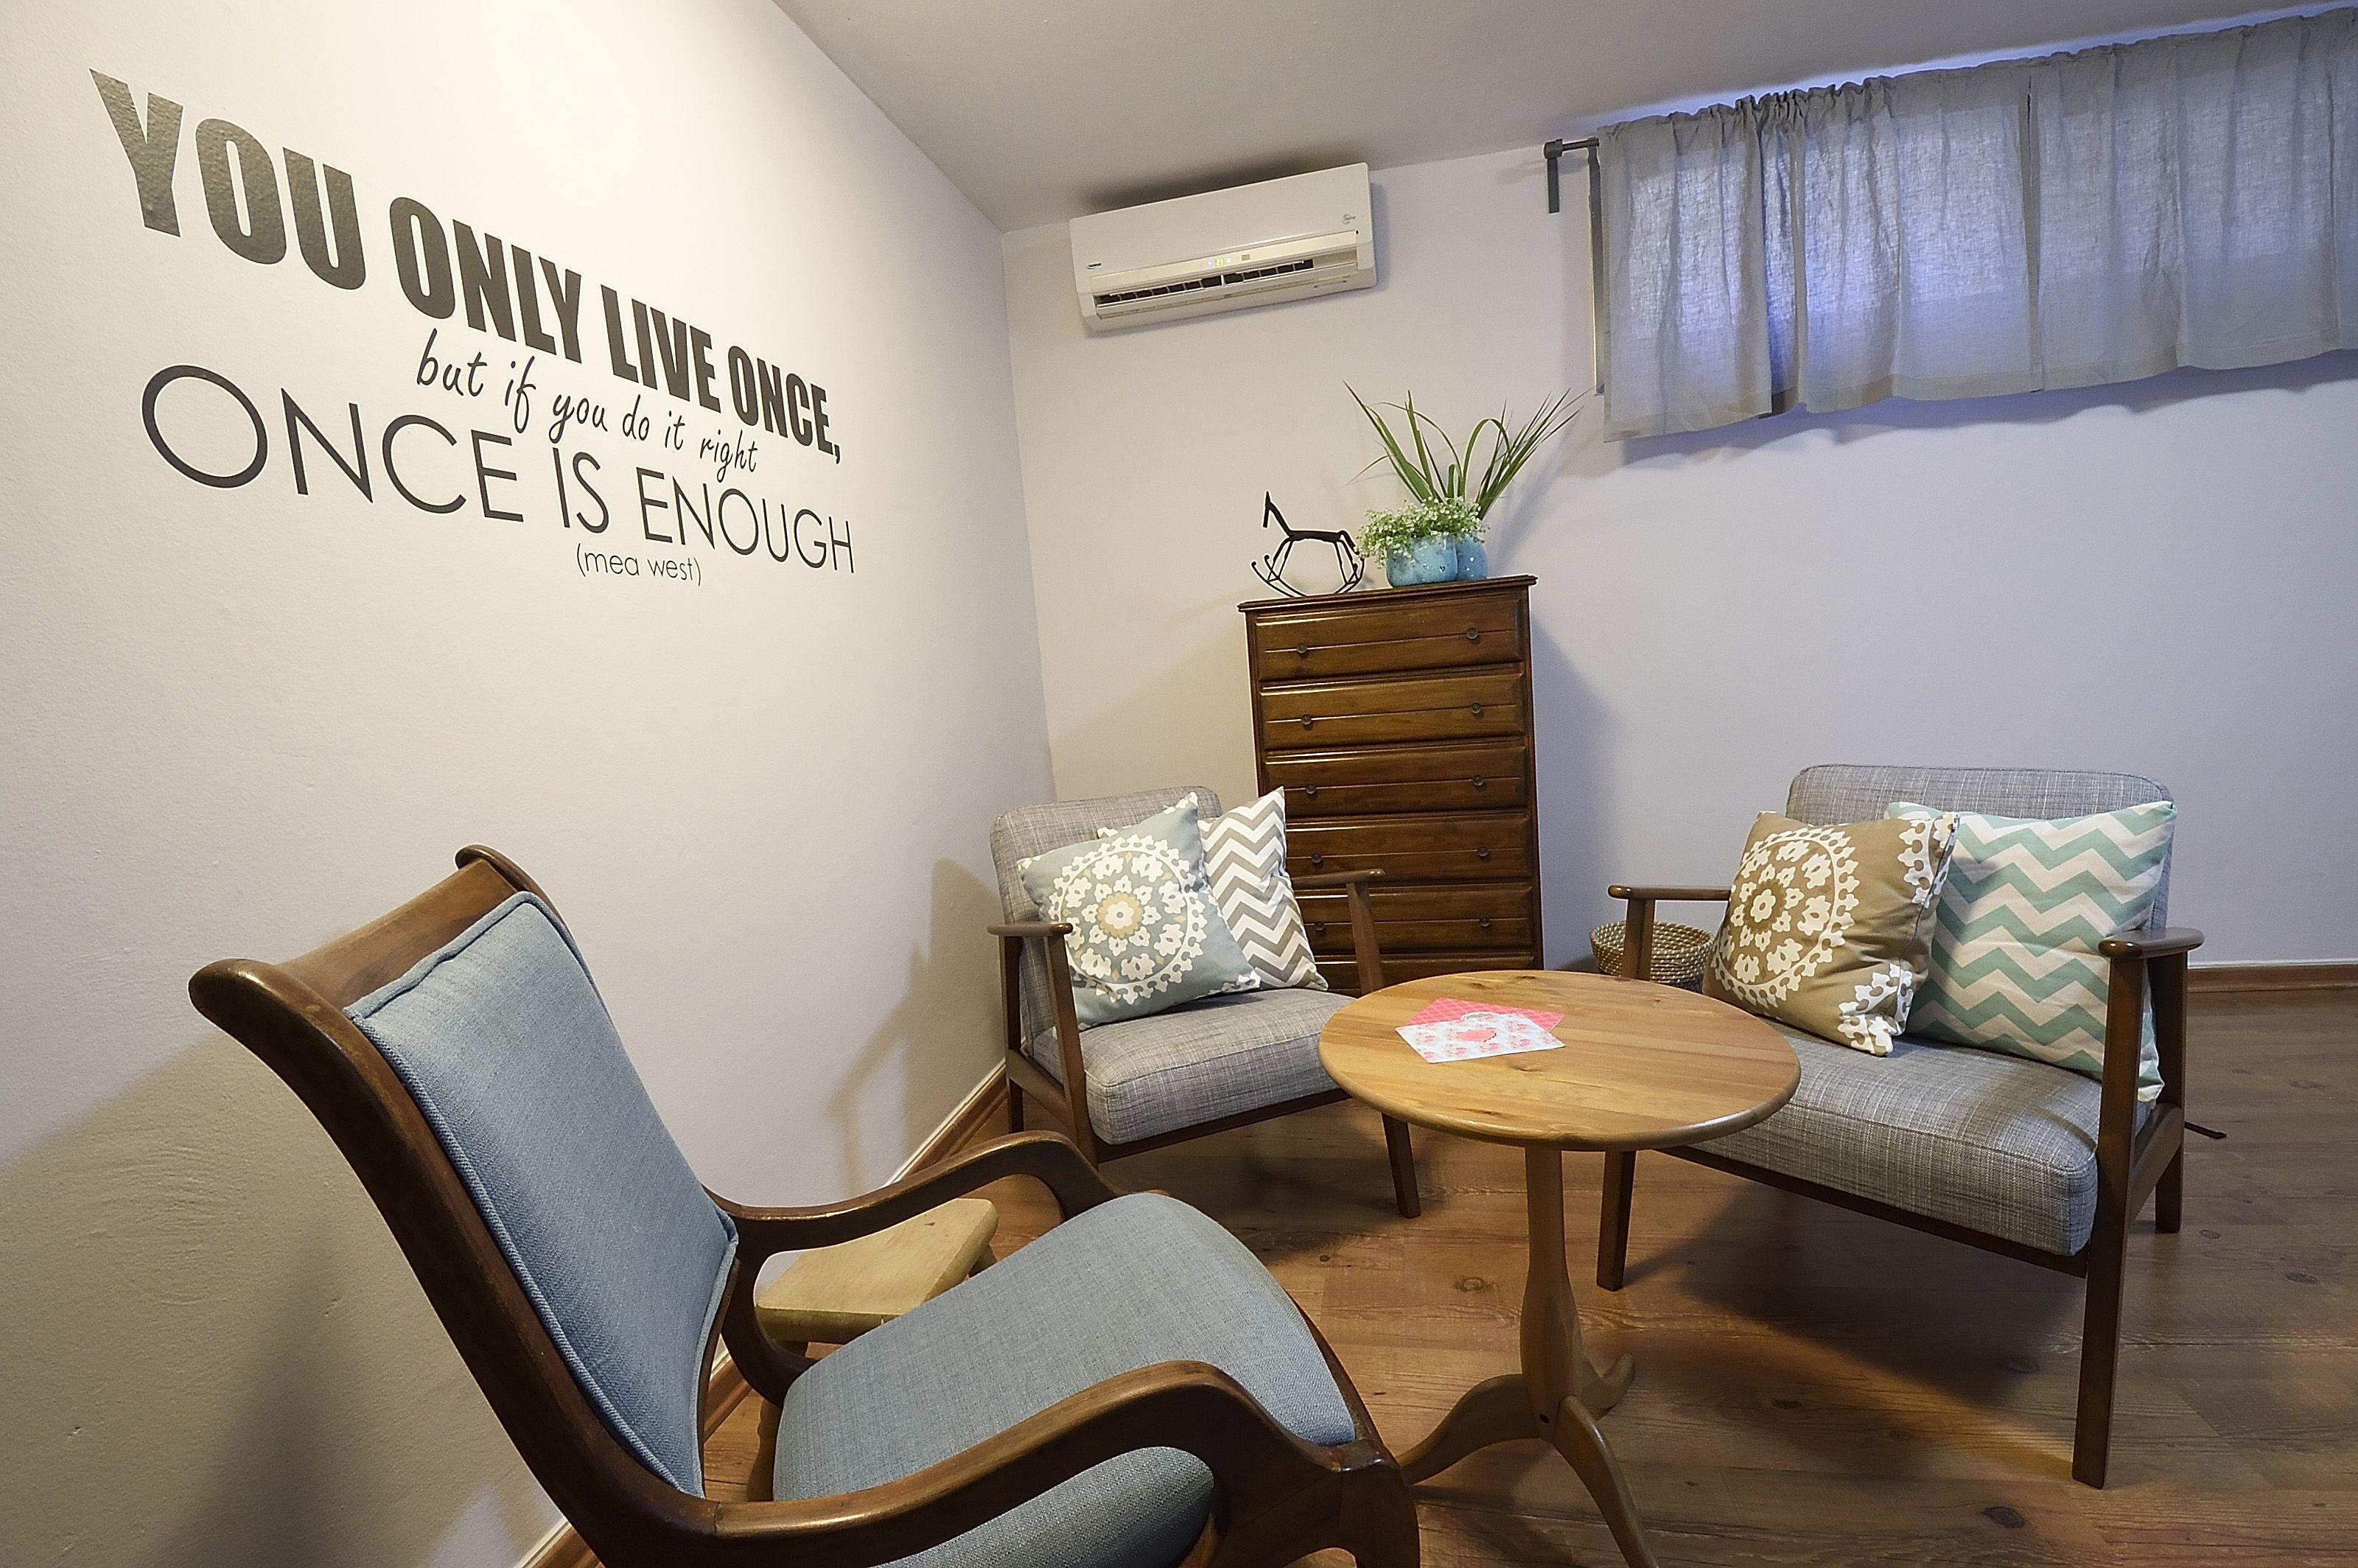 Home clinic Interiordesign Design ProjectsDecor